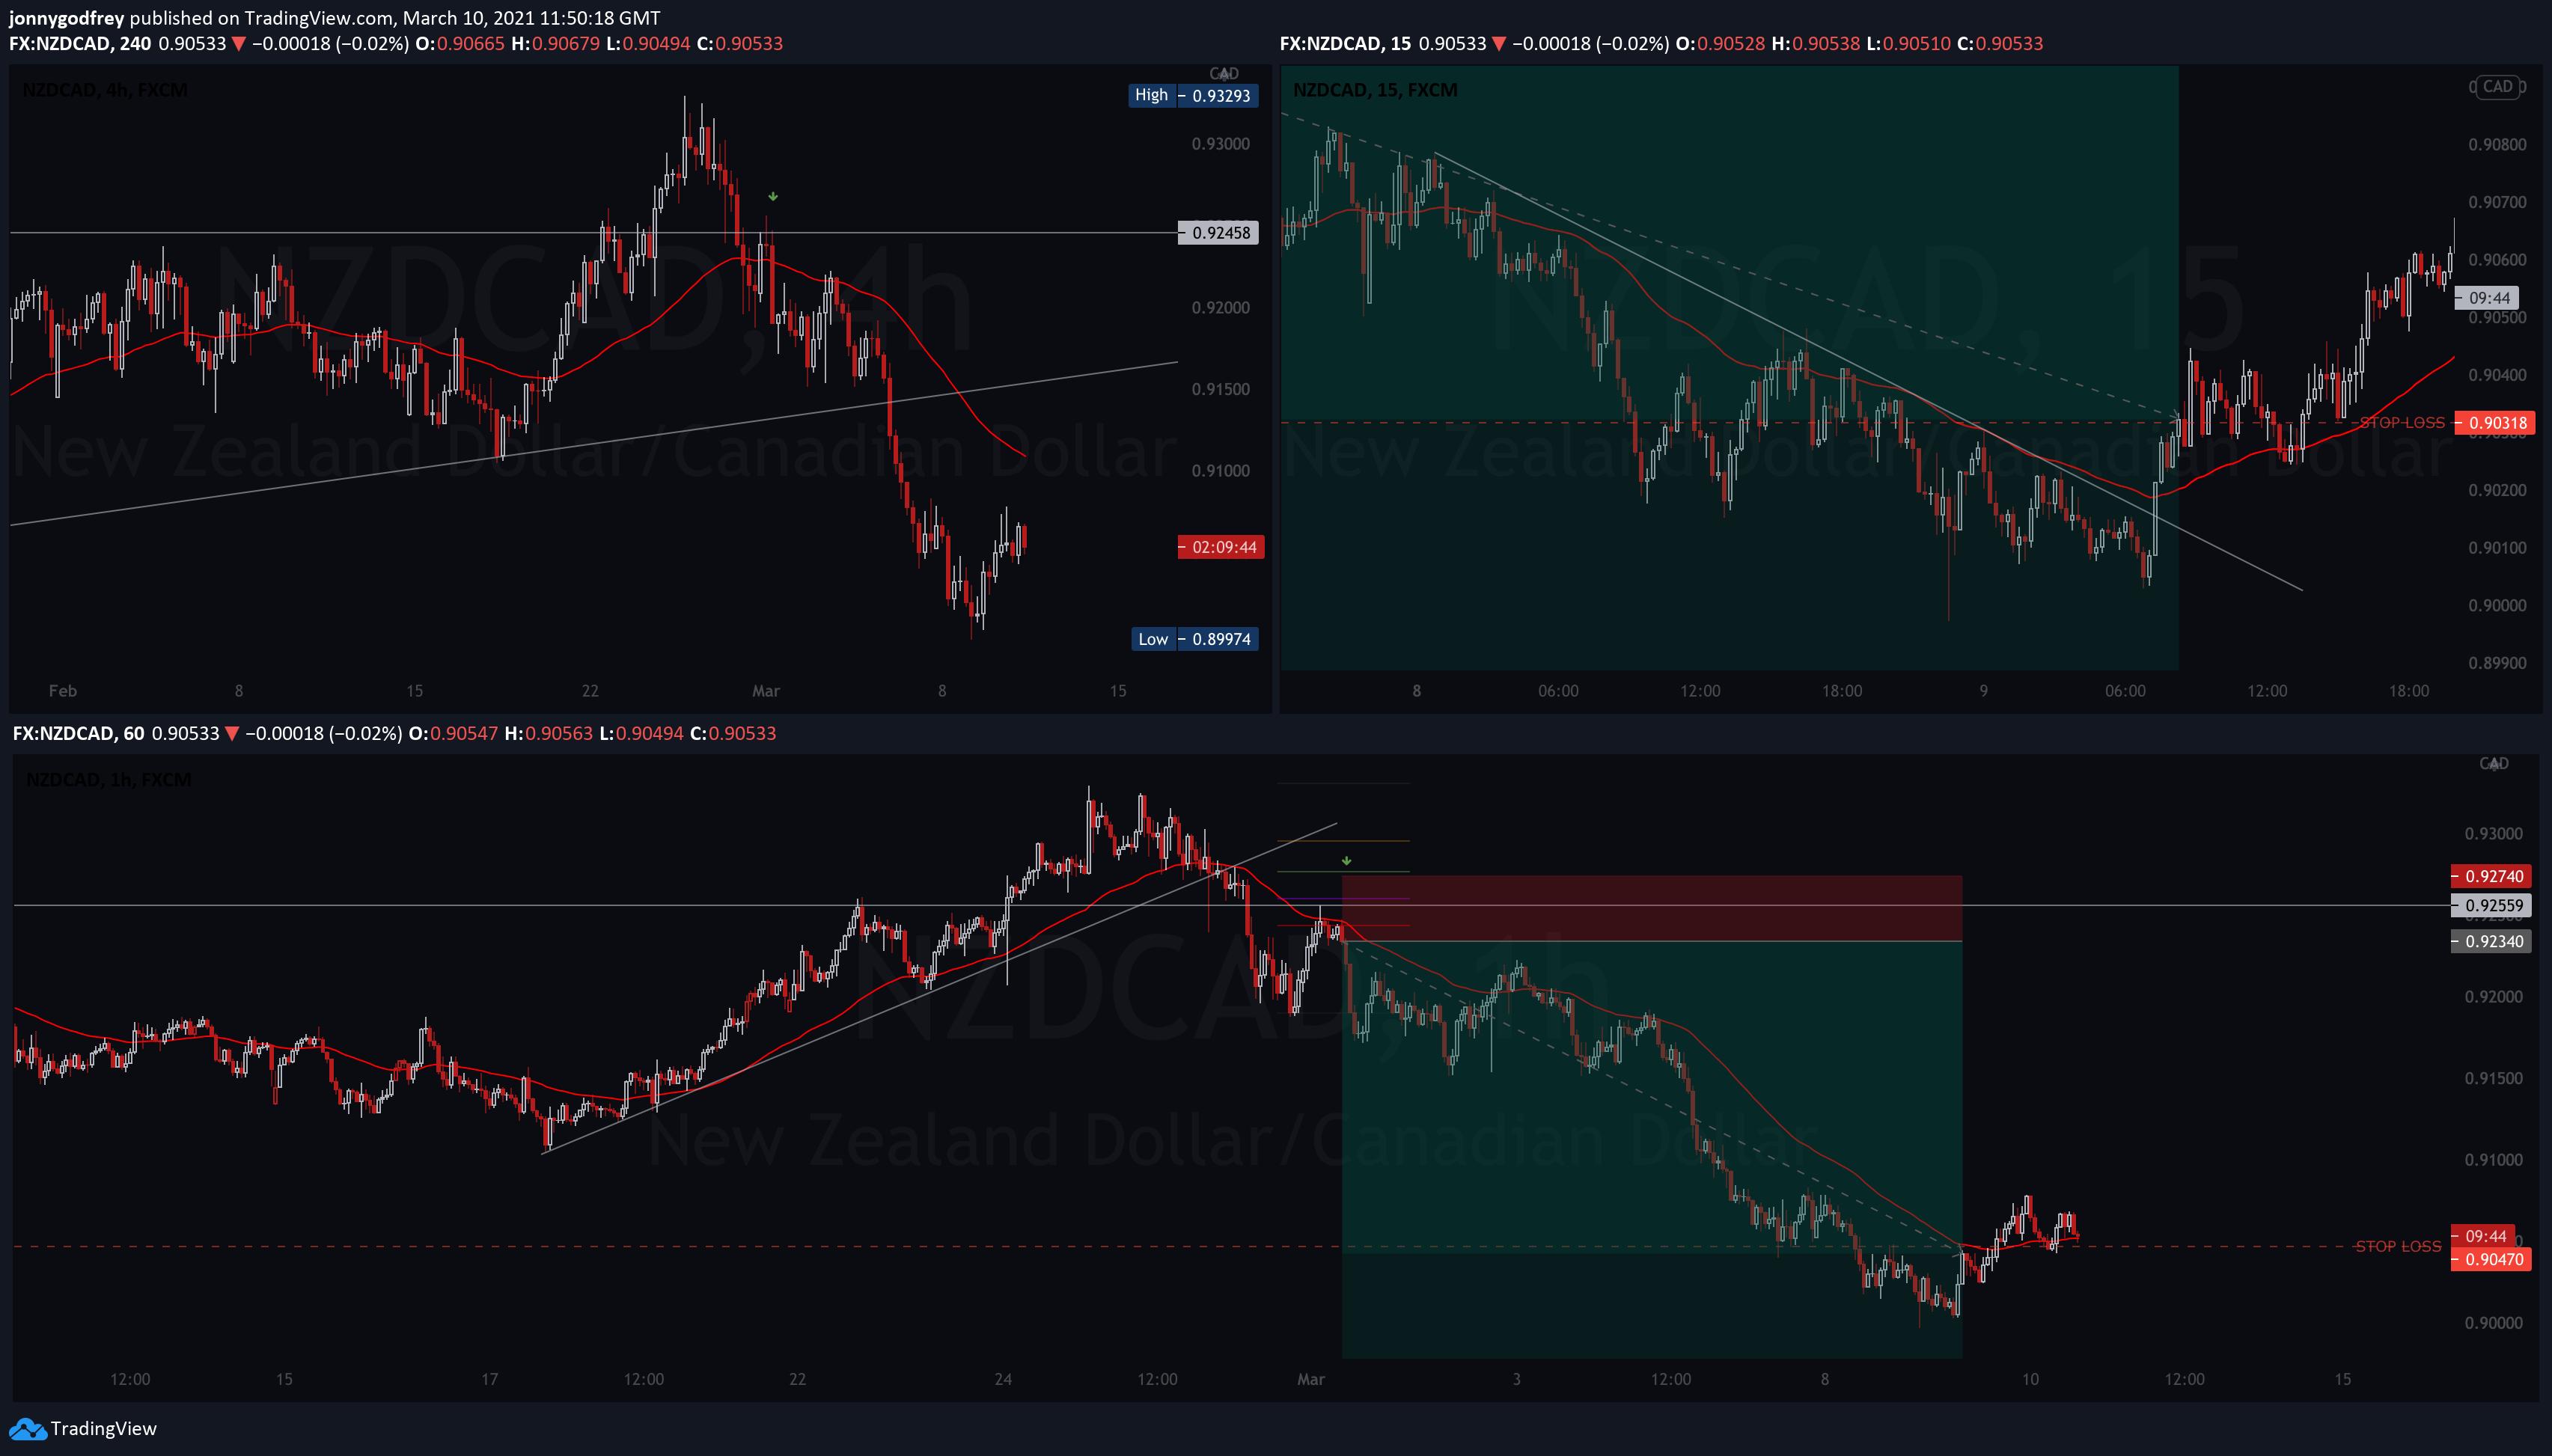 NZDCAD 4 hour chart